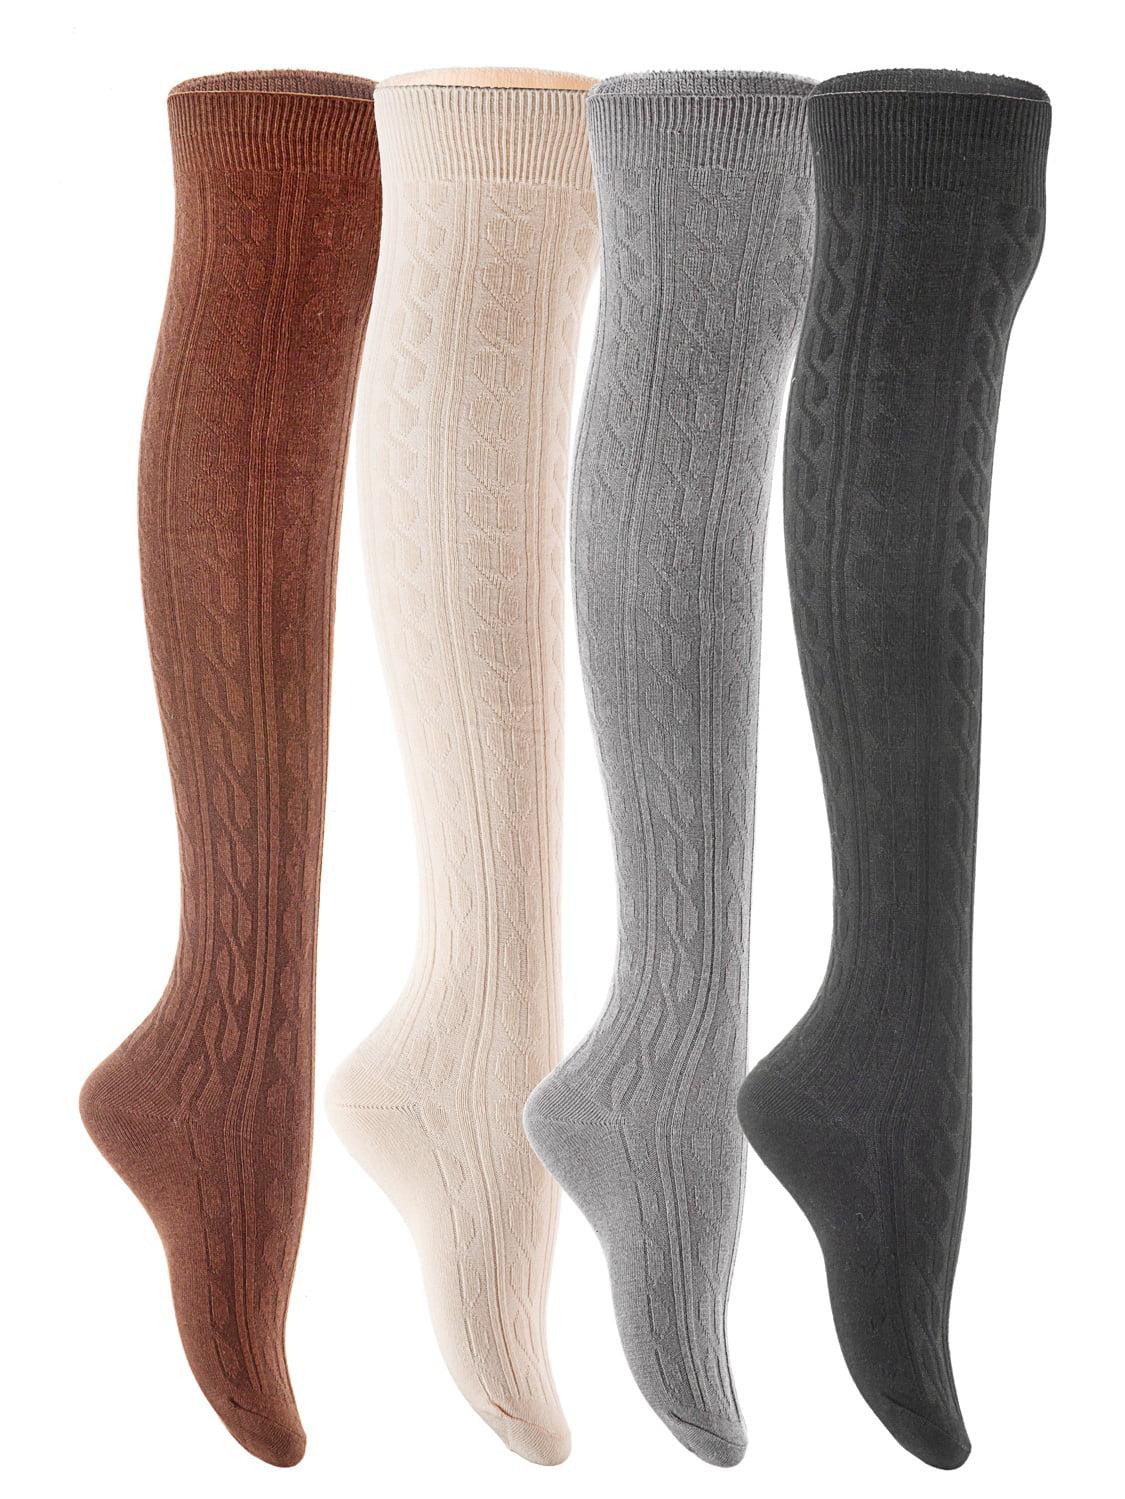 Lian LifeStyle Big Girls' 4 Pairs Over Knee High Cotton Boot Socks JMYP1024 Size L/XL(Black,Coffee,Dark Grey, Beige)